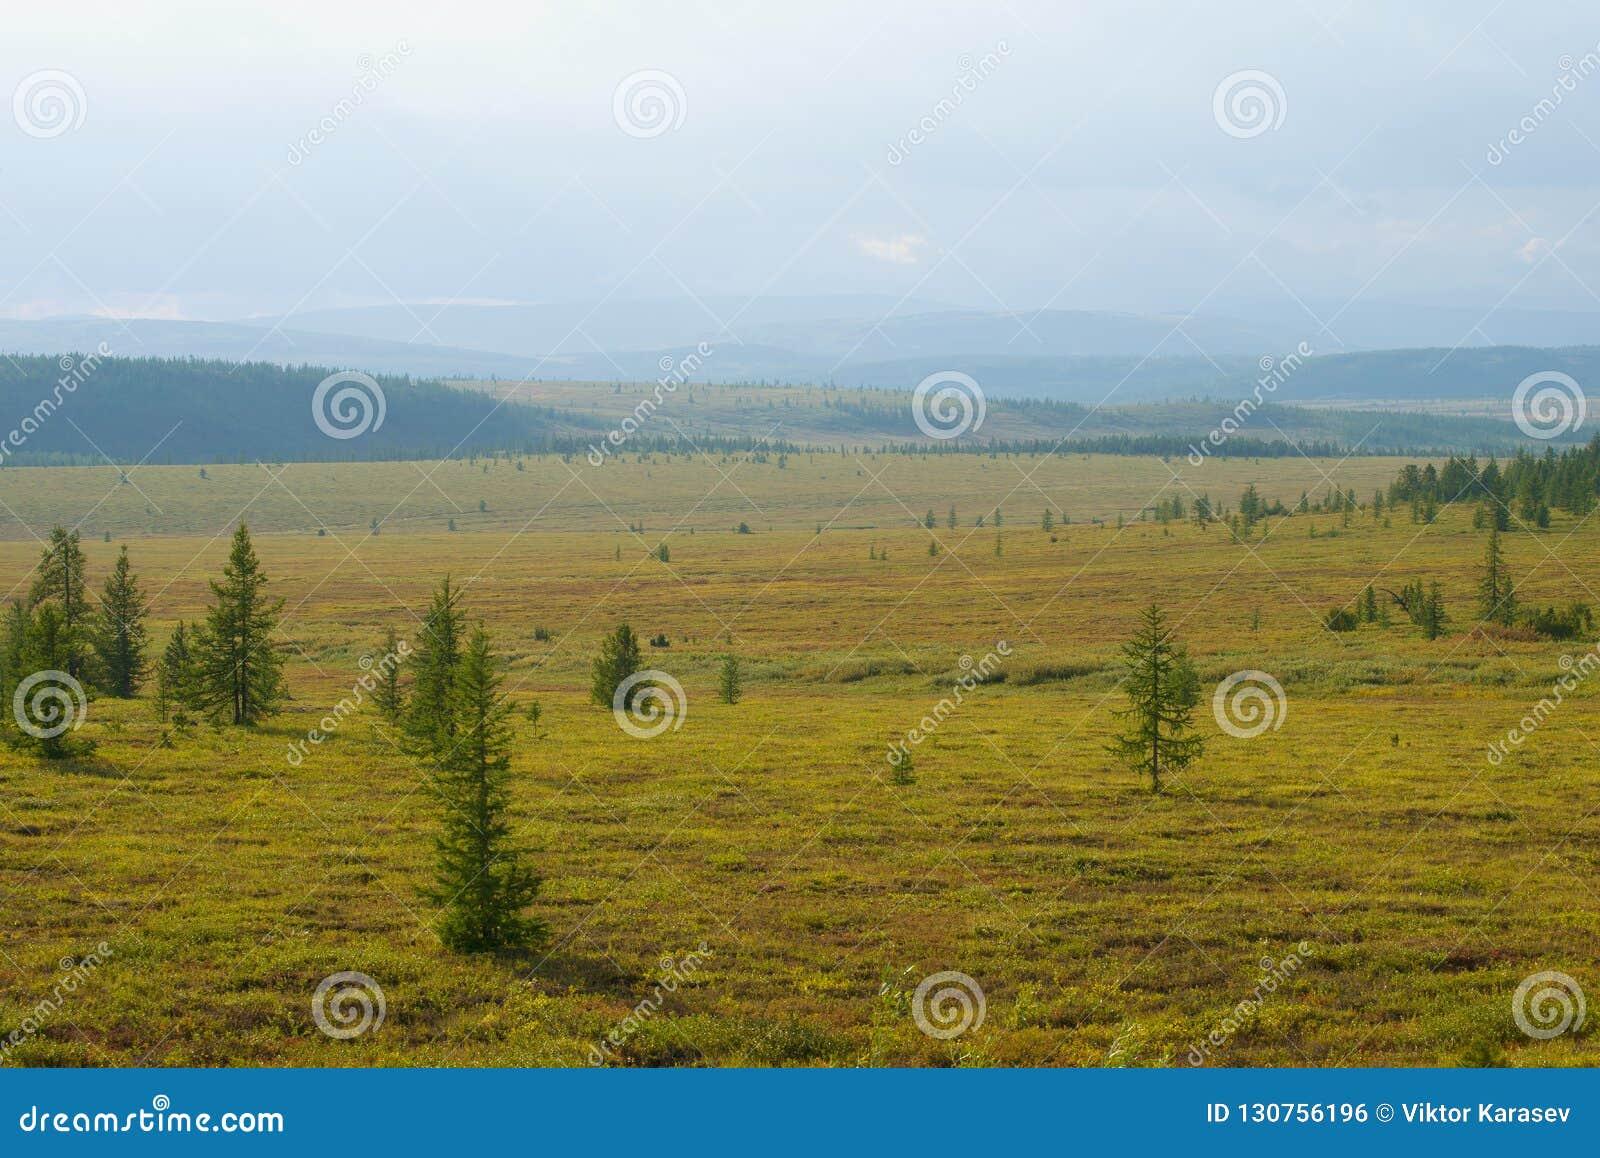 Sunny August-dag in de Yamal-toendra Polair gebied, Rusland